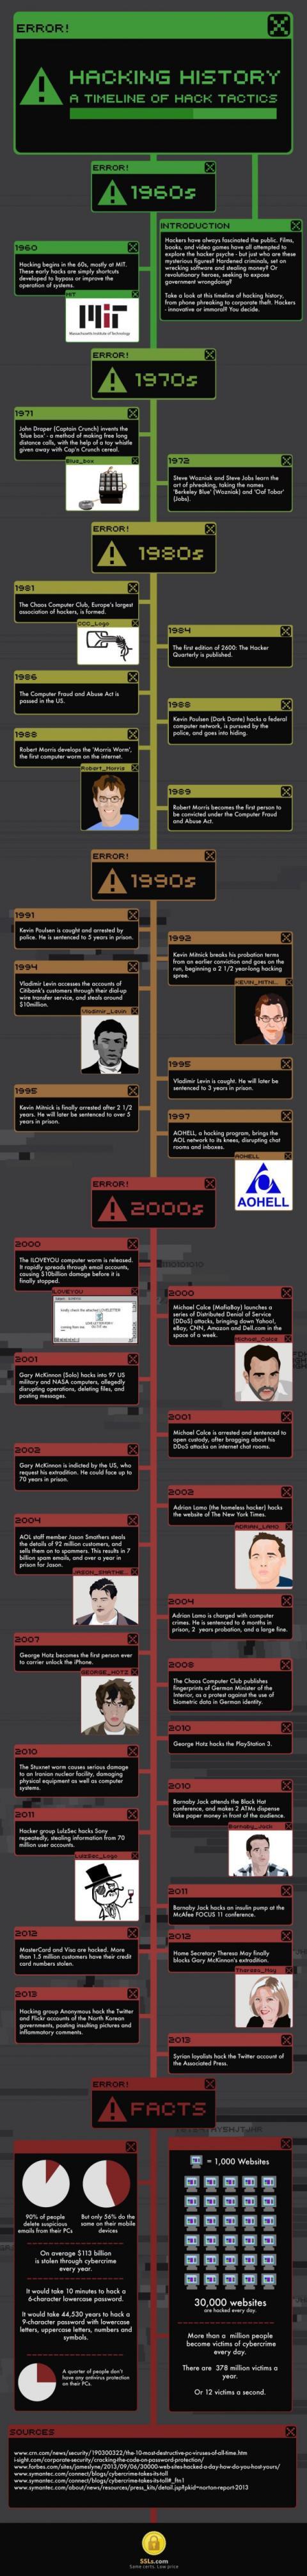 hacking historia hackers